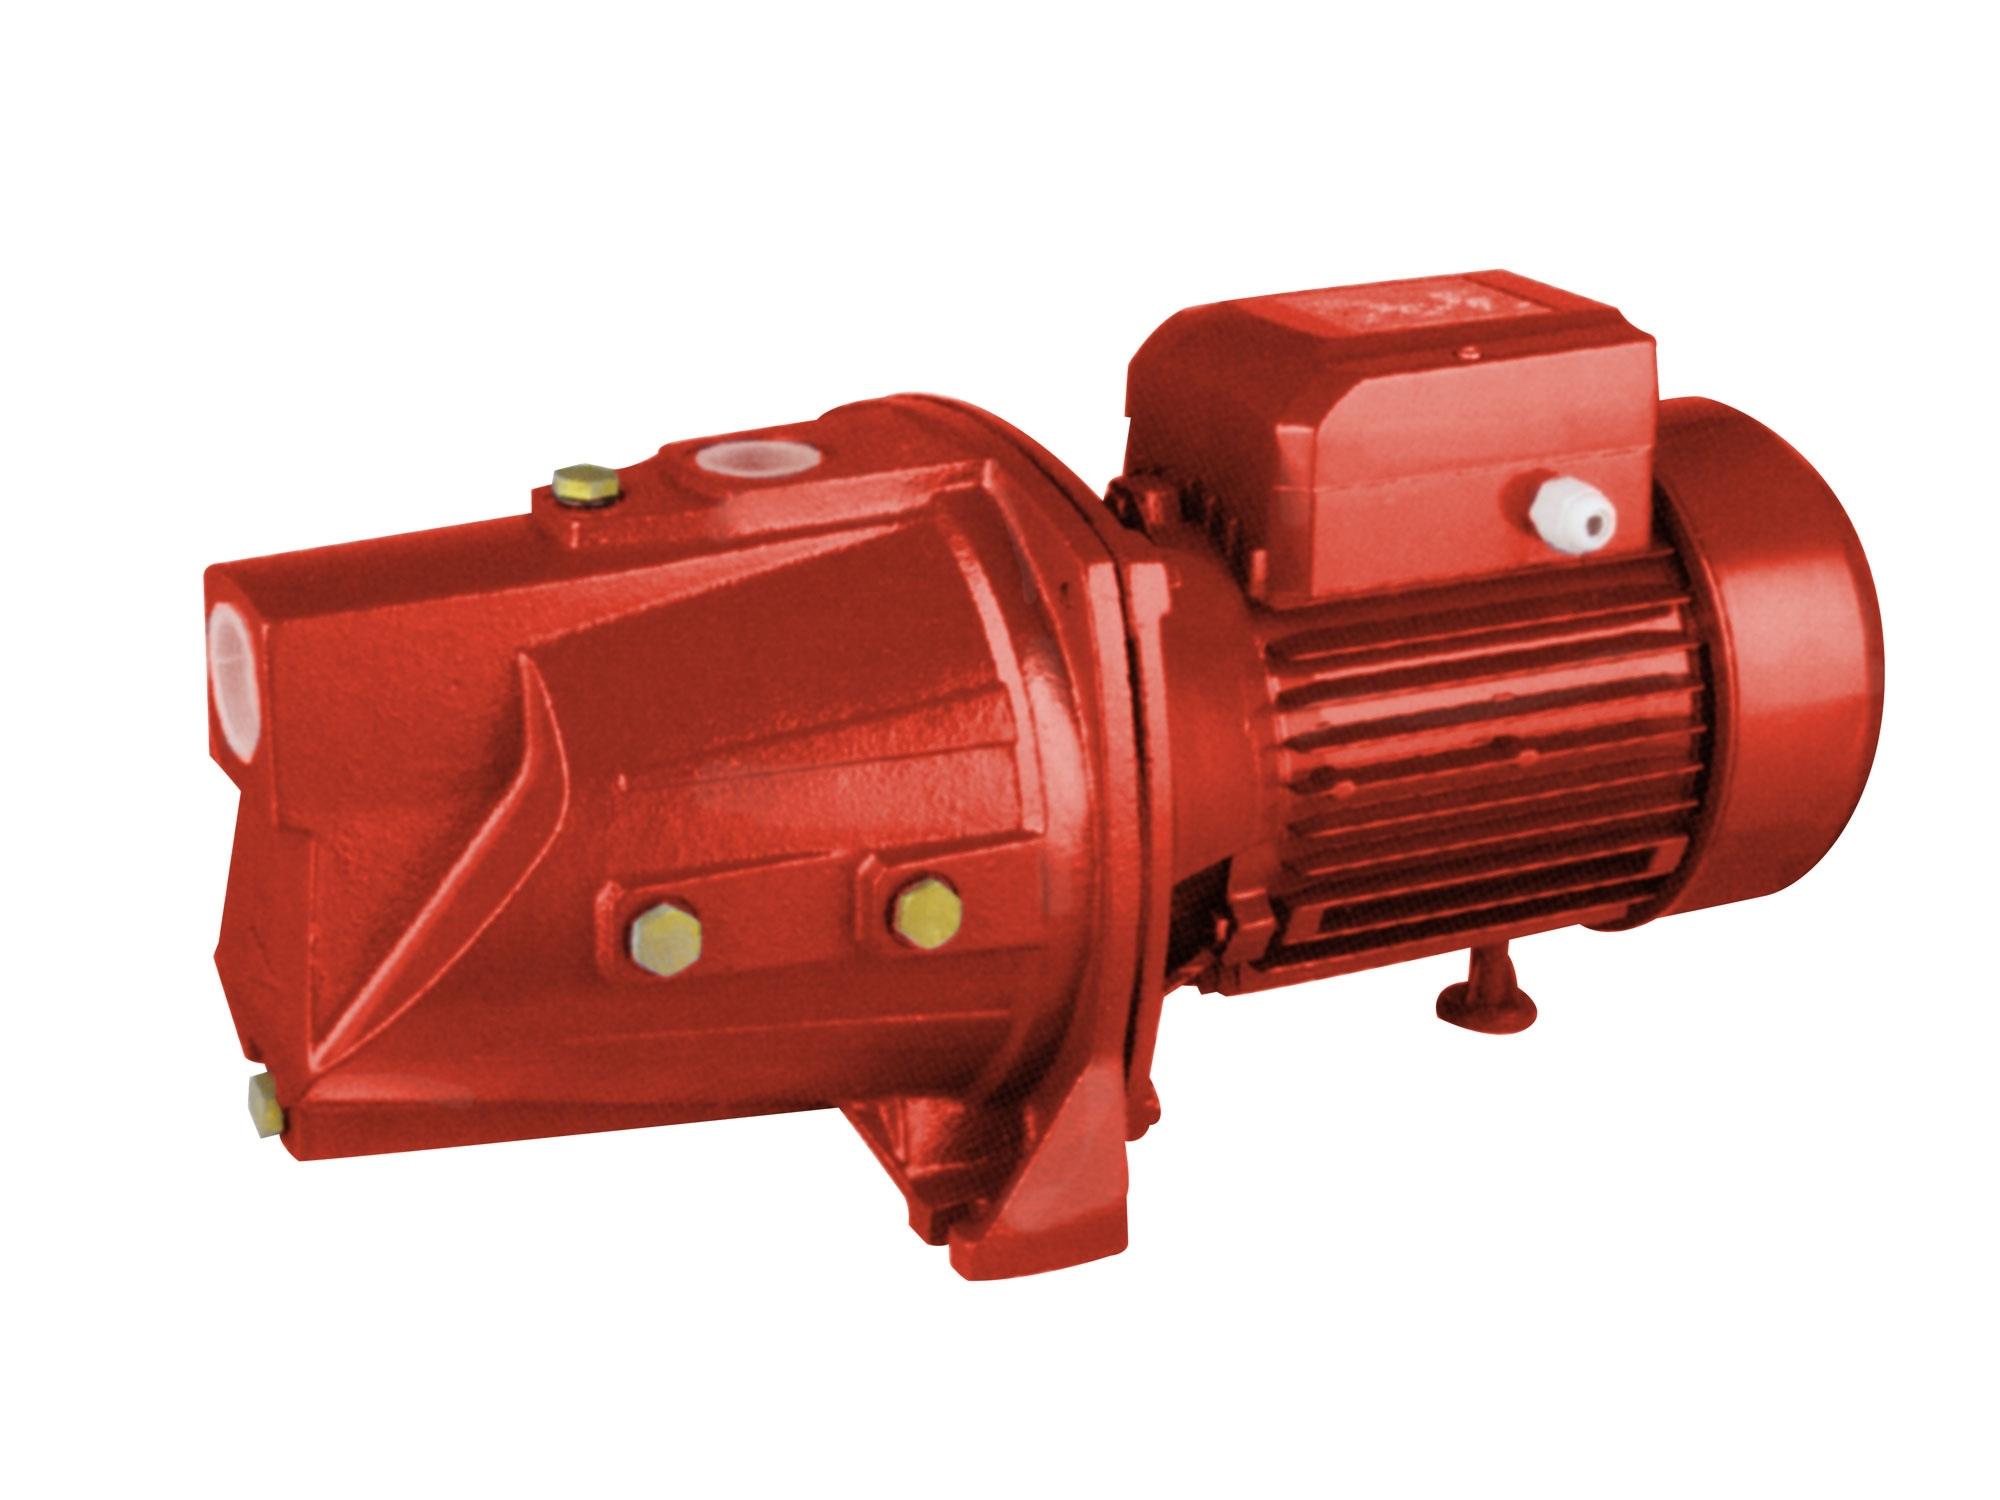 čerpadlo proudové, 1100W, 9500l/hod, EXTOL PREMIUM 8895081